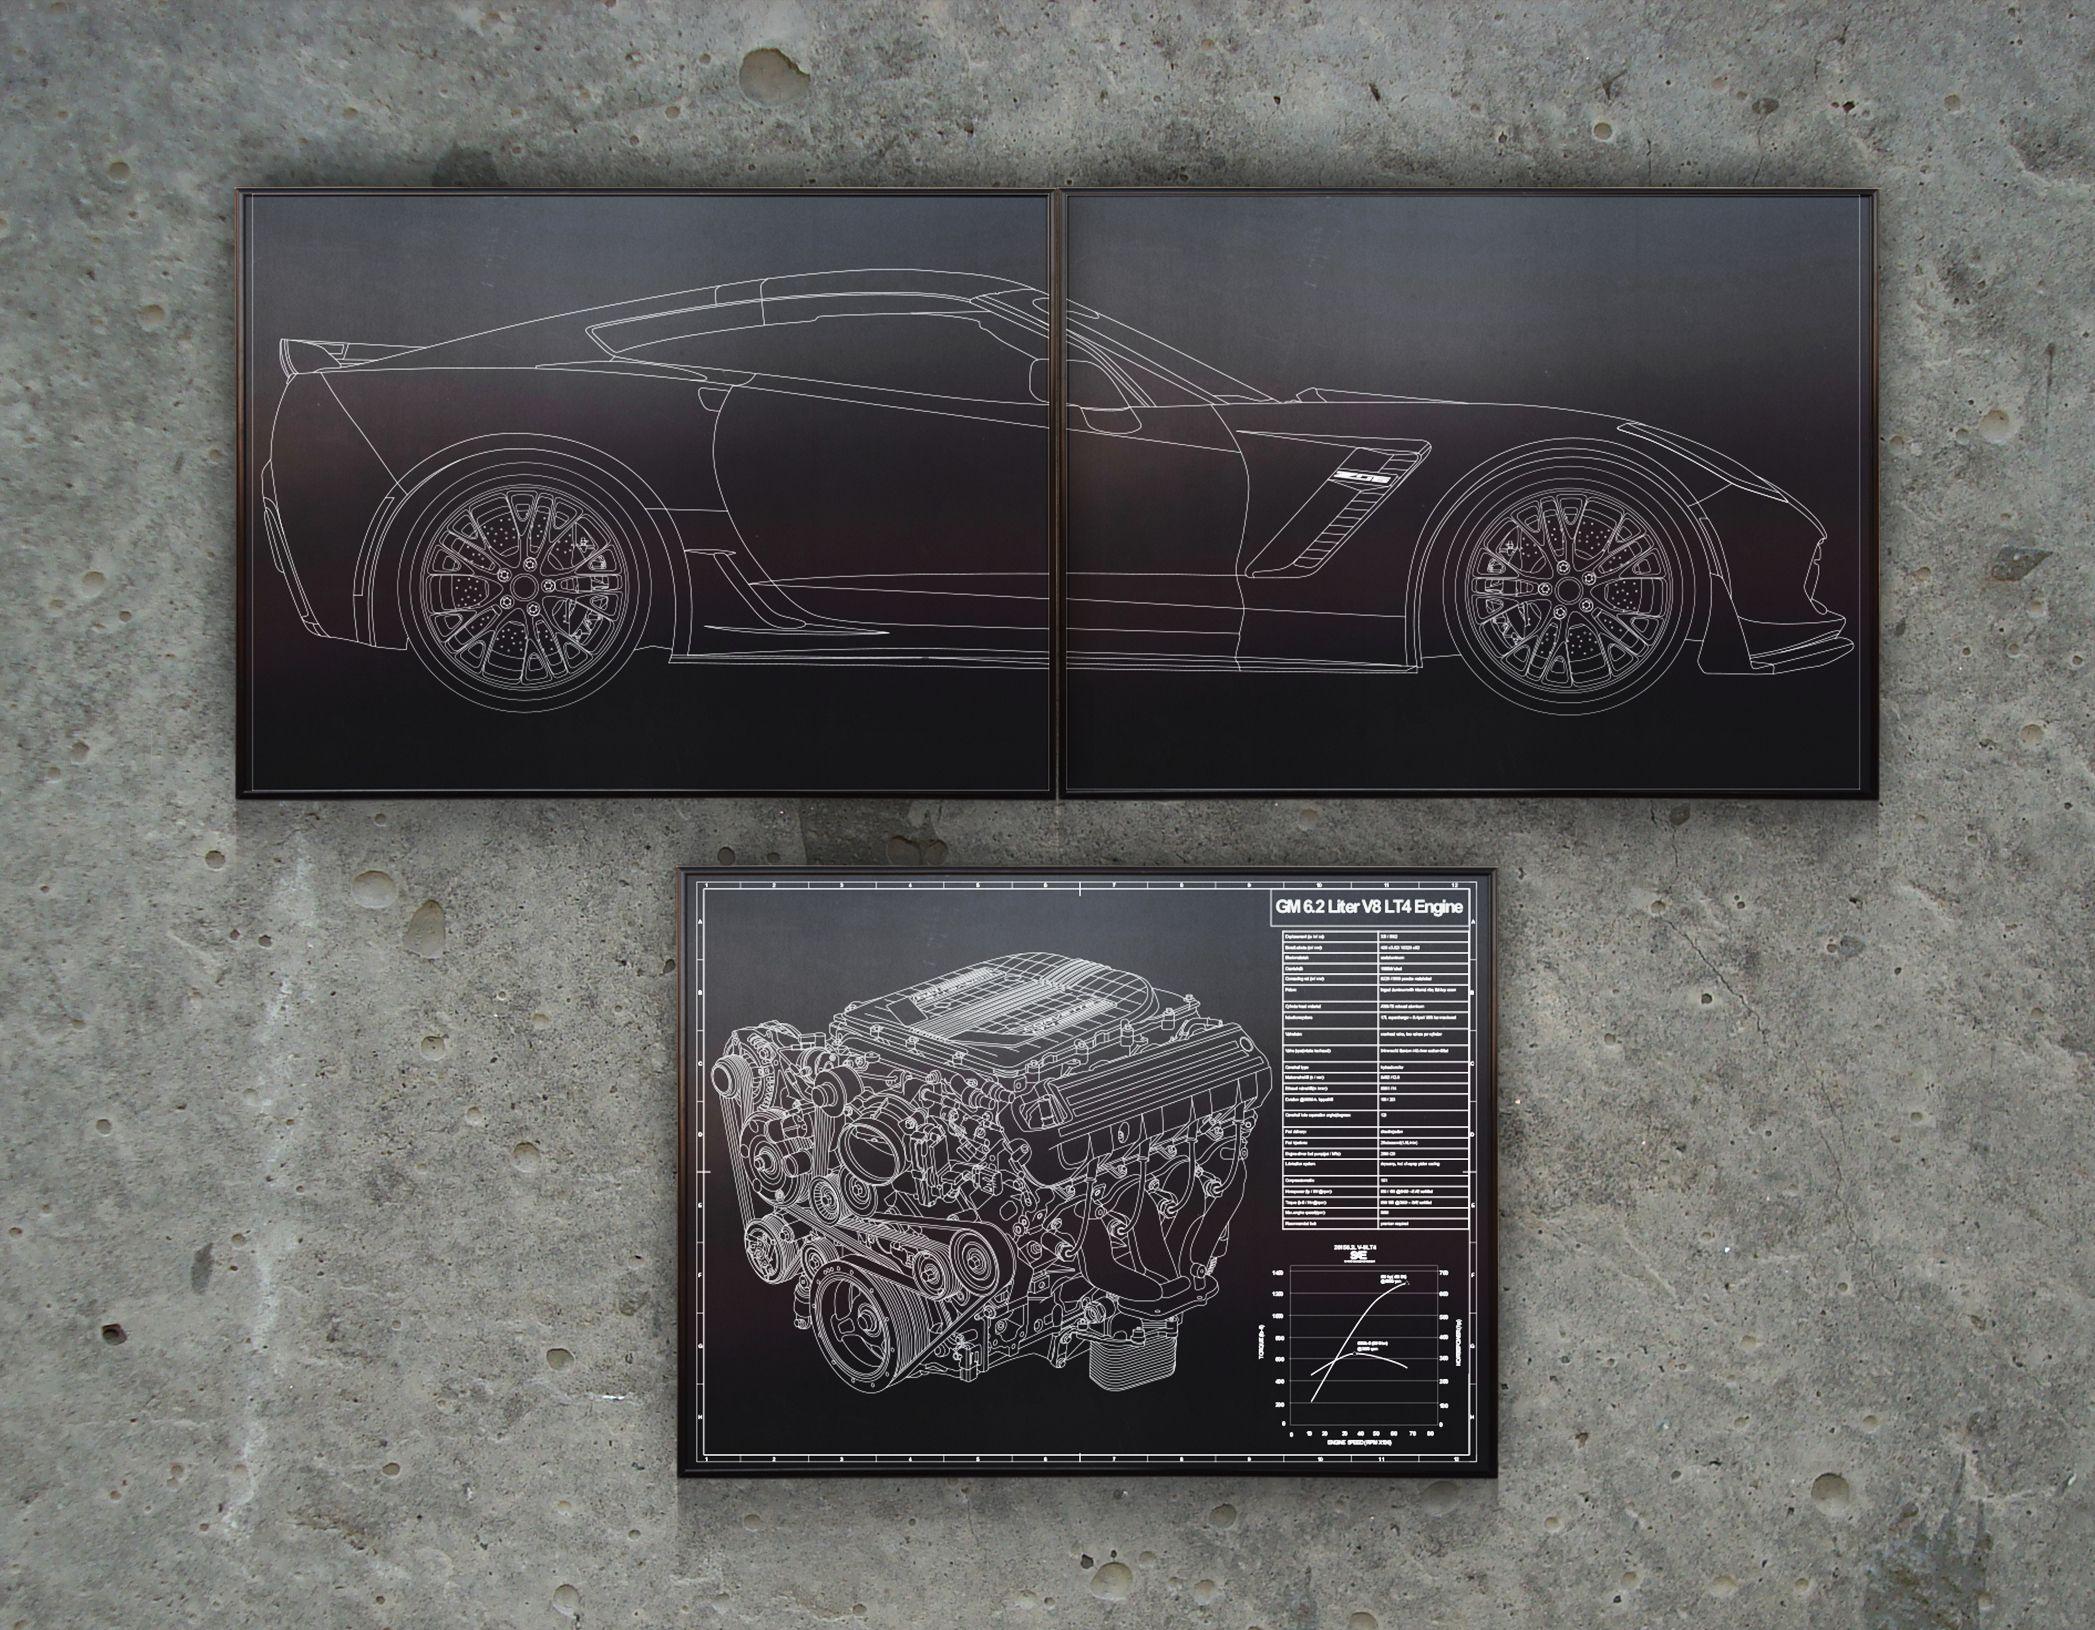 Corvette c7 z06 laser engraved blueprint art laser engraved corvette c7 z06 laser engraved blueprint art malvernweather Images